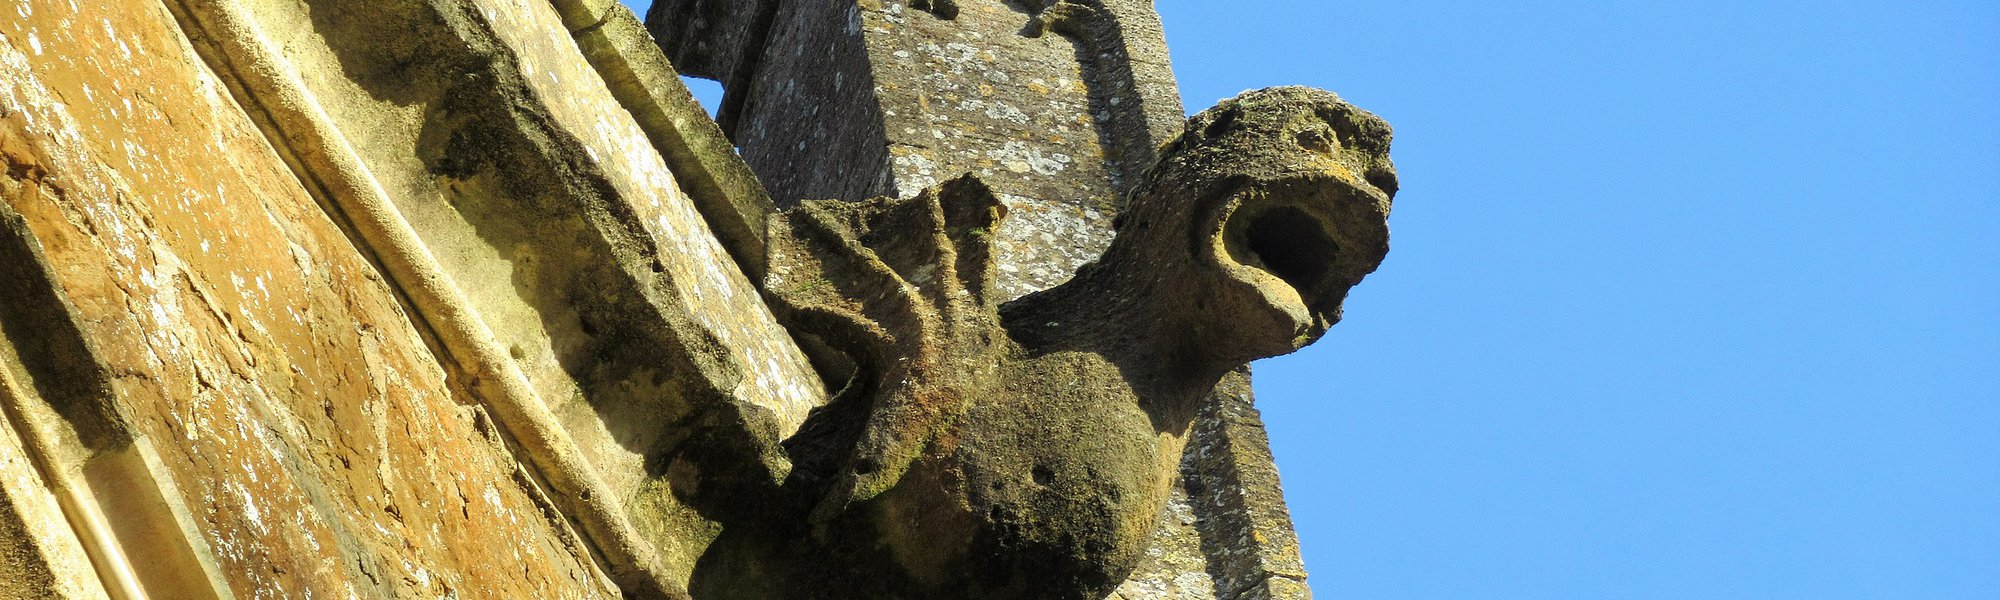 Gargoyle at St. Mary's Church, Bloxham